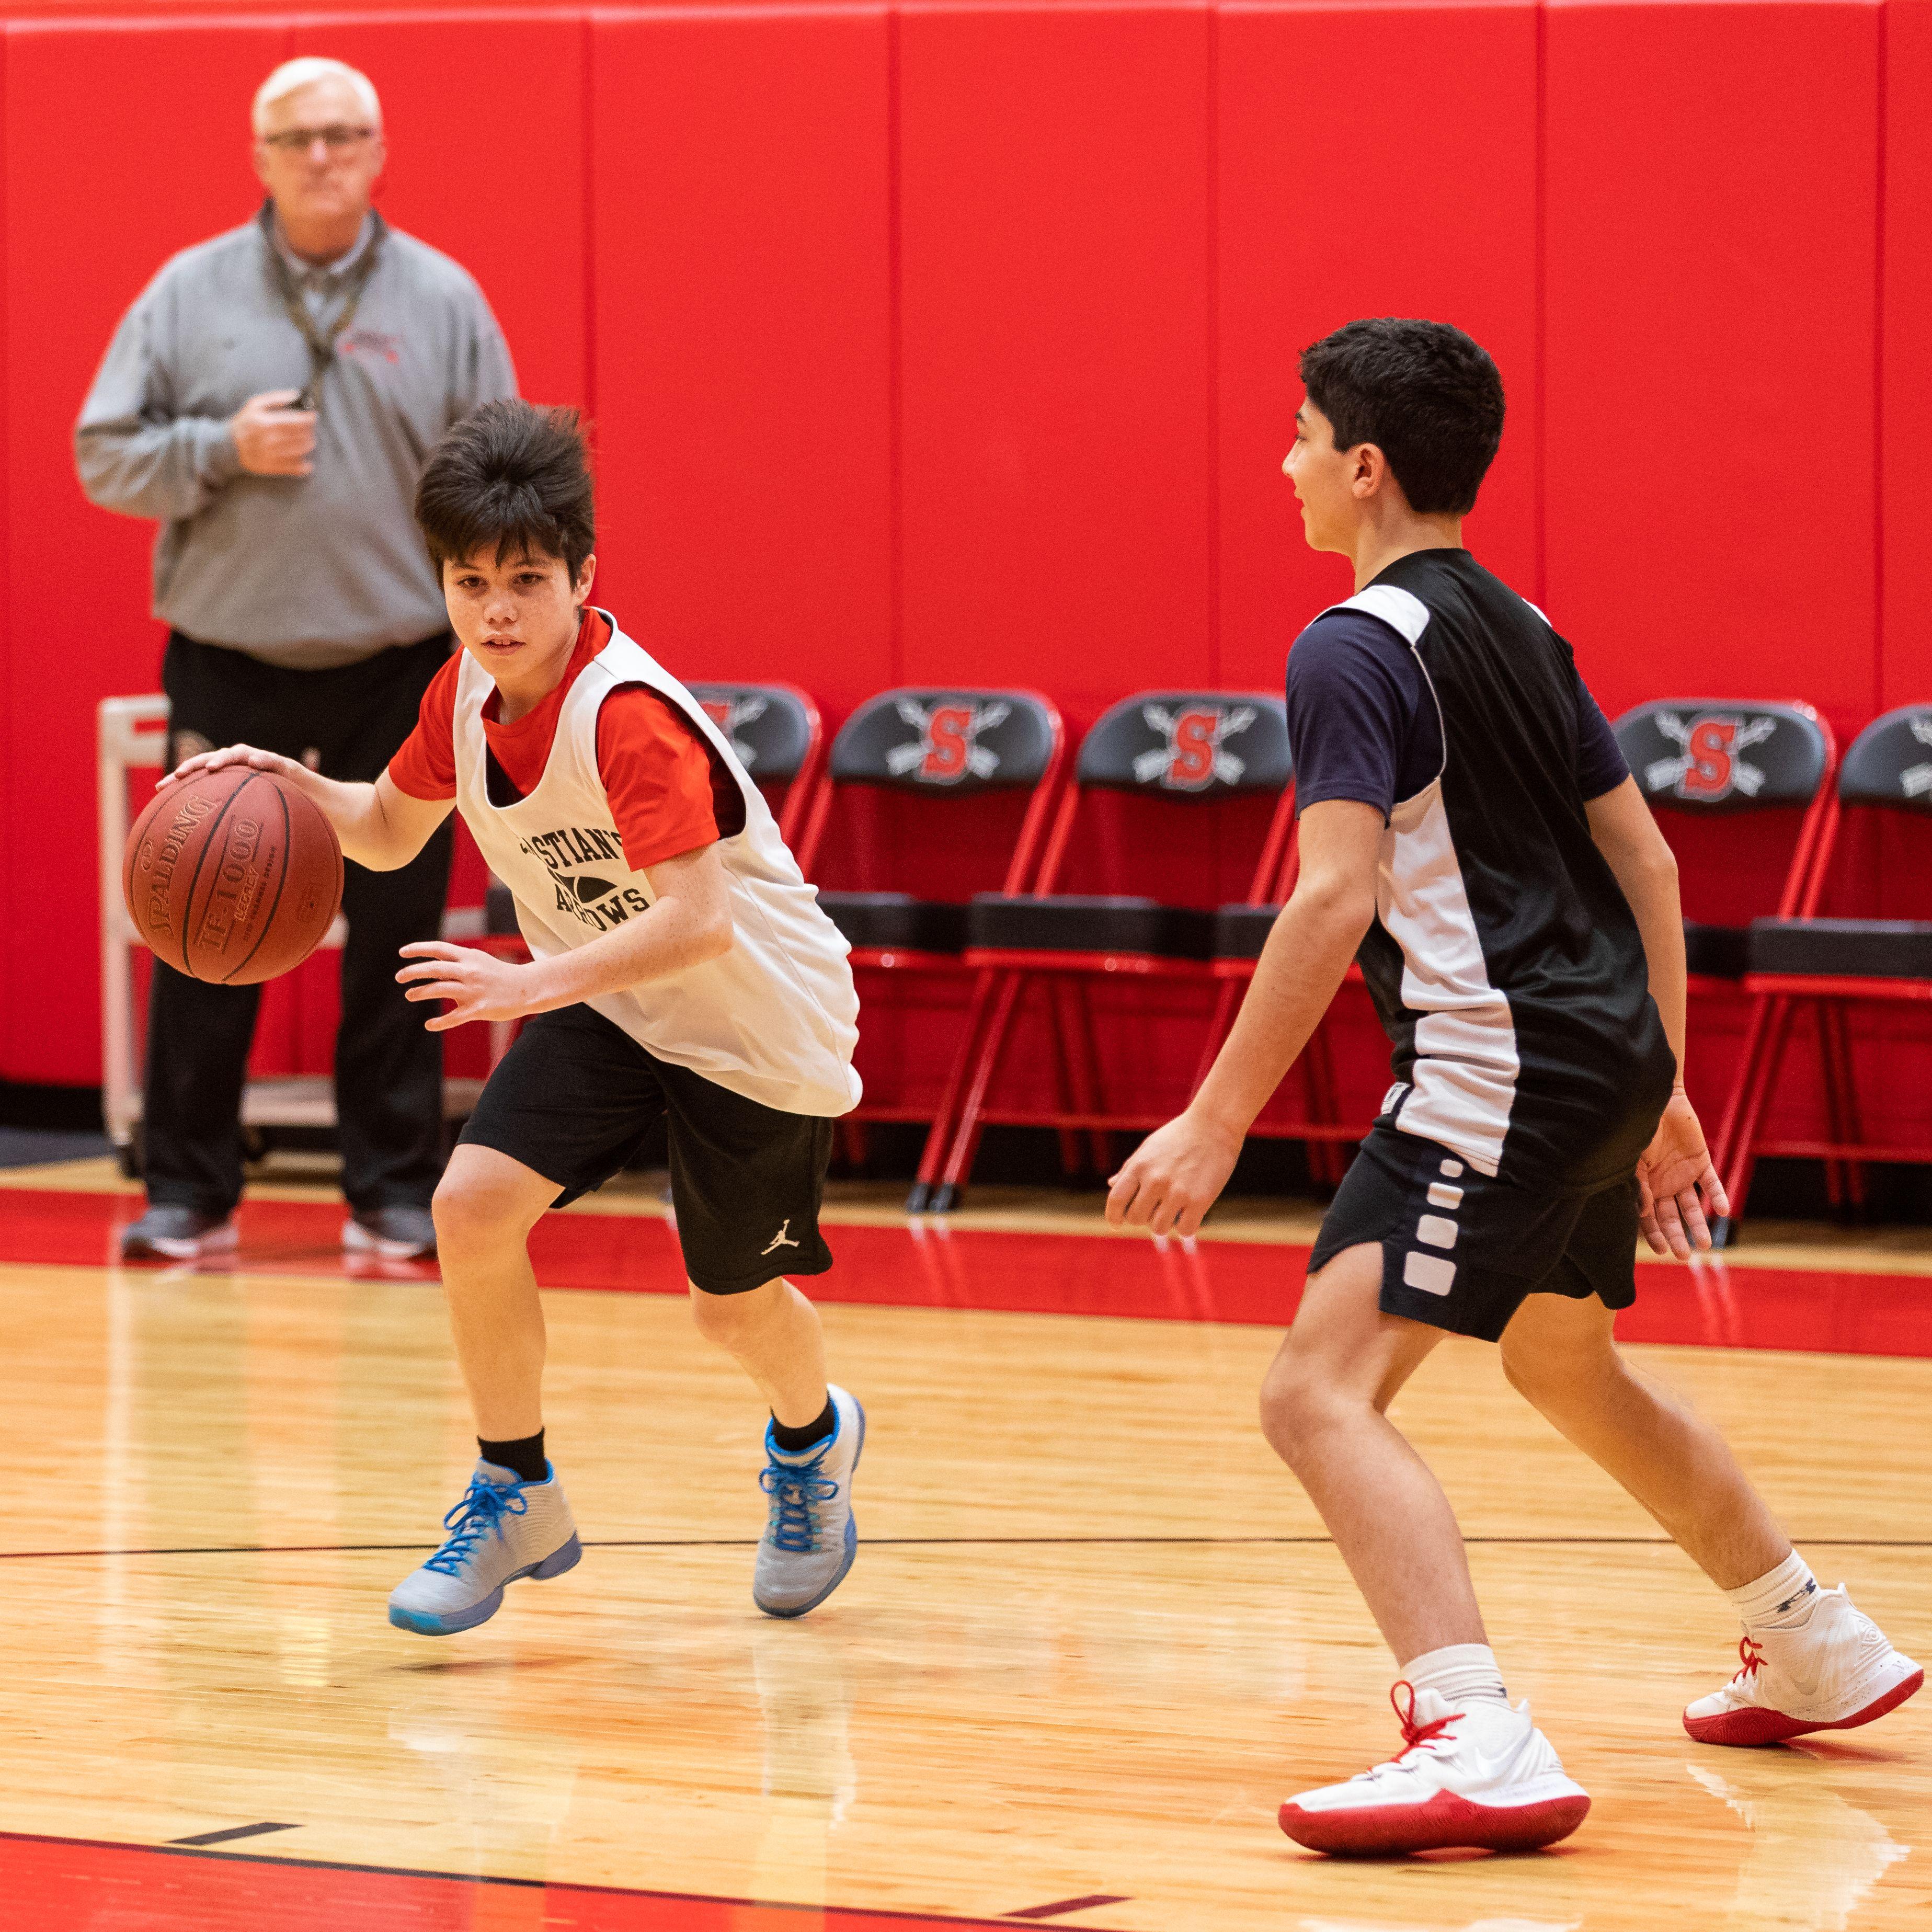 St. Sebastian's Basketball Clinics